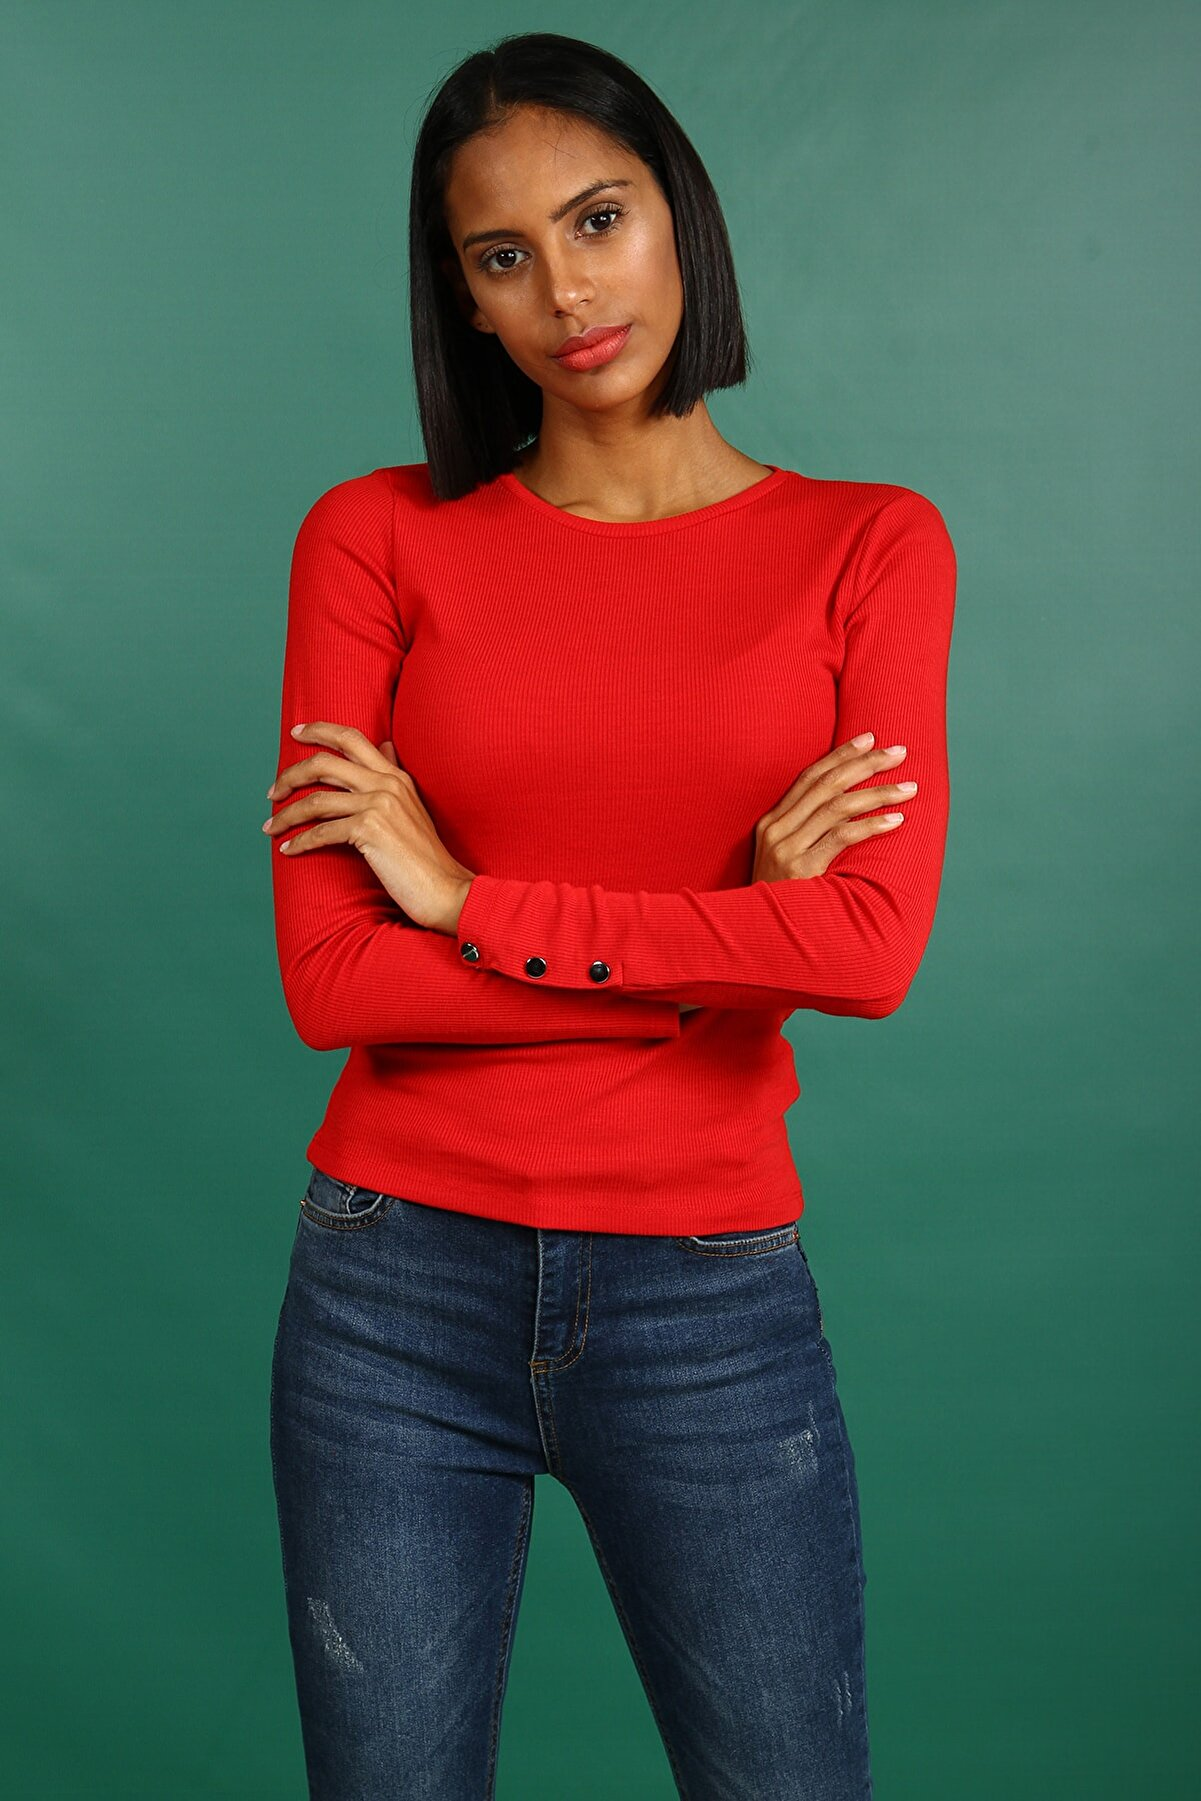 Collezione Kırmızı Kadın Kırmızı Spor Slim T-shirt Uzun Kol